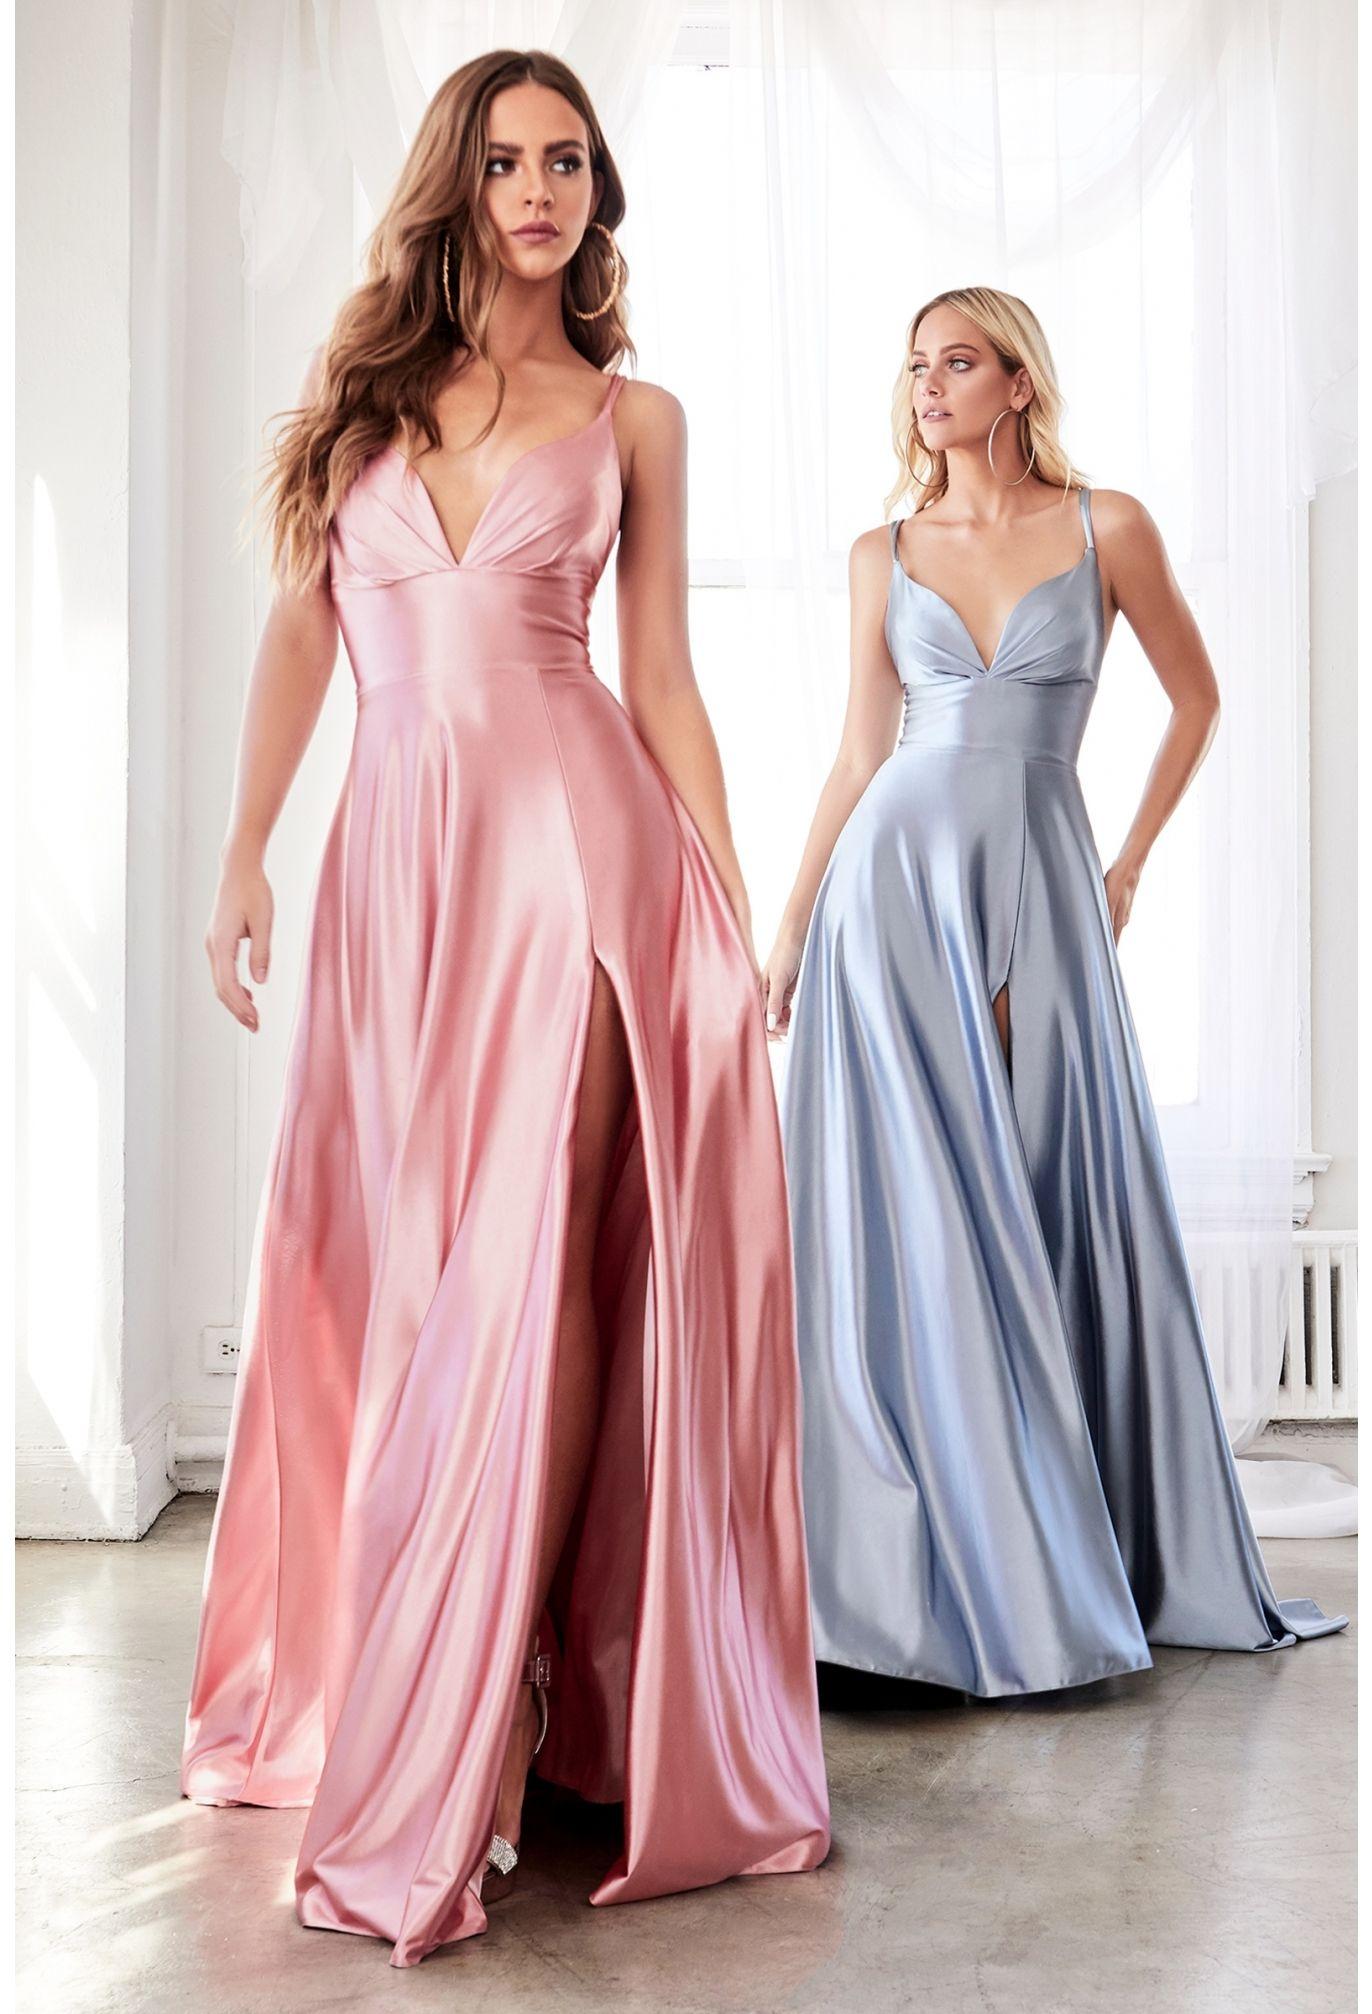 Prom Dresses | Satin dress long, Black chiffon dress, A ...